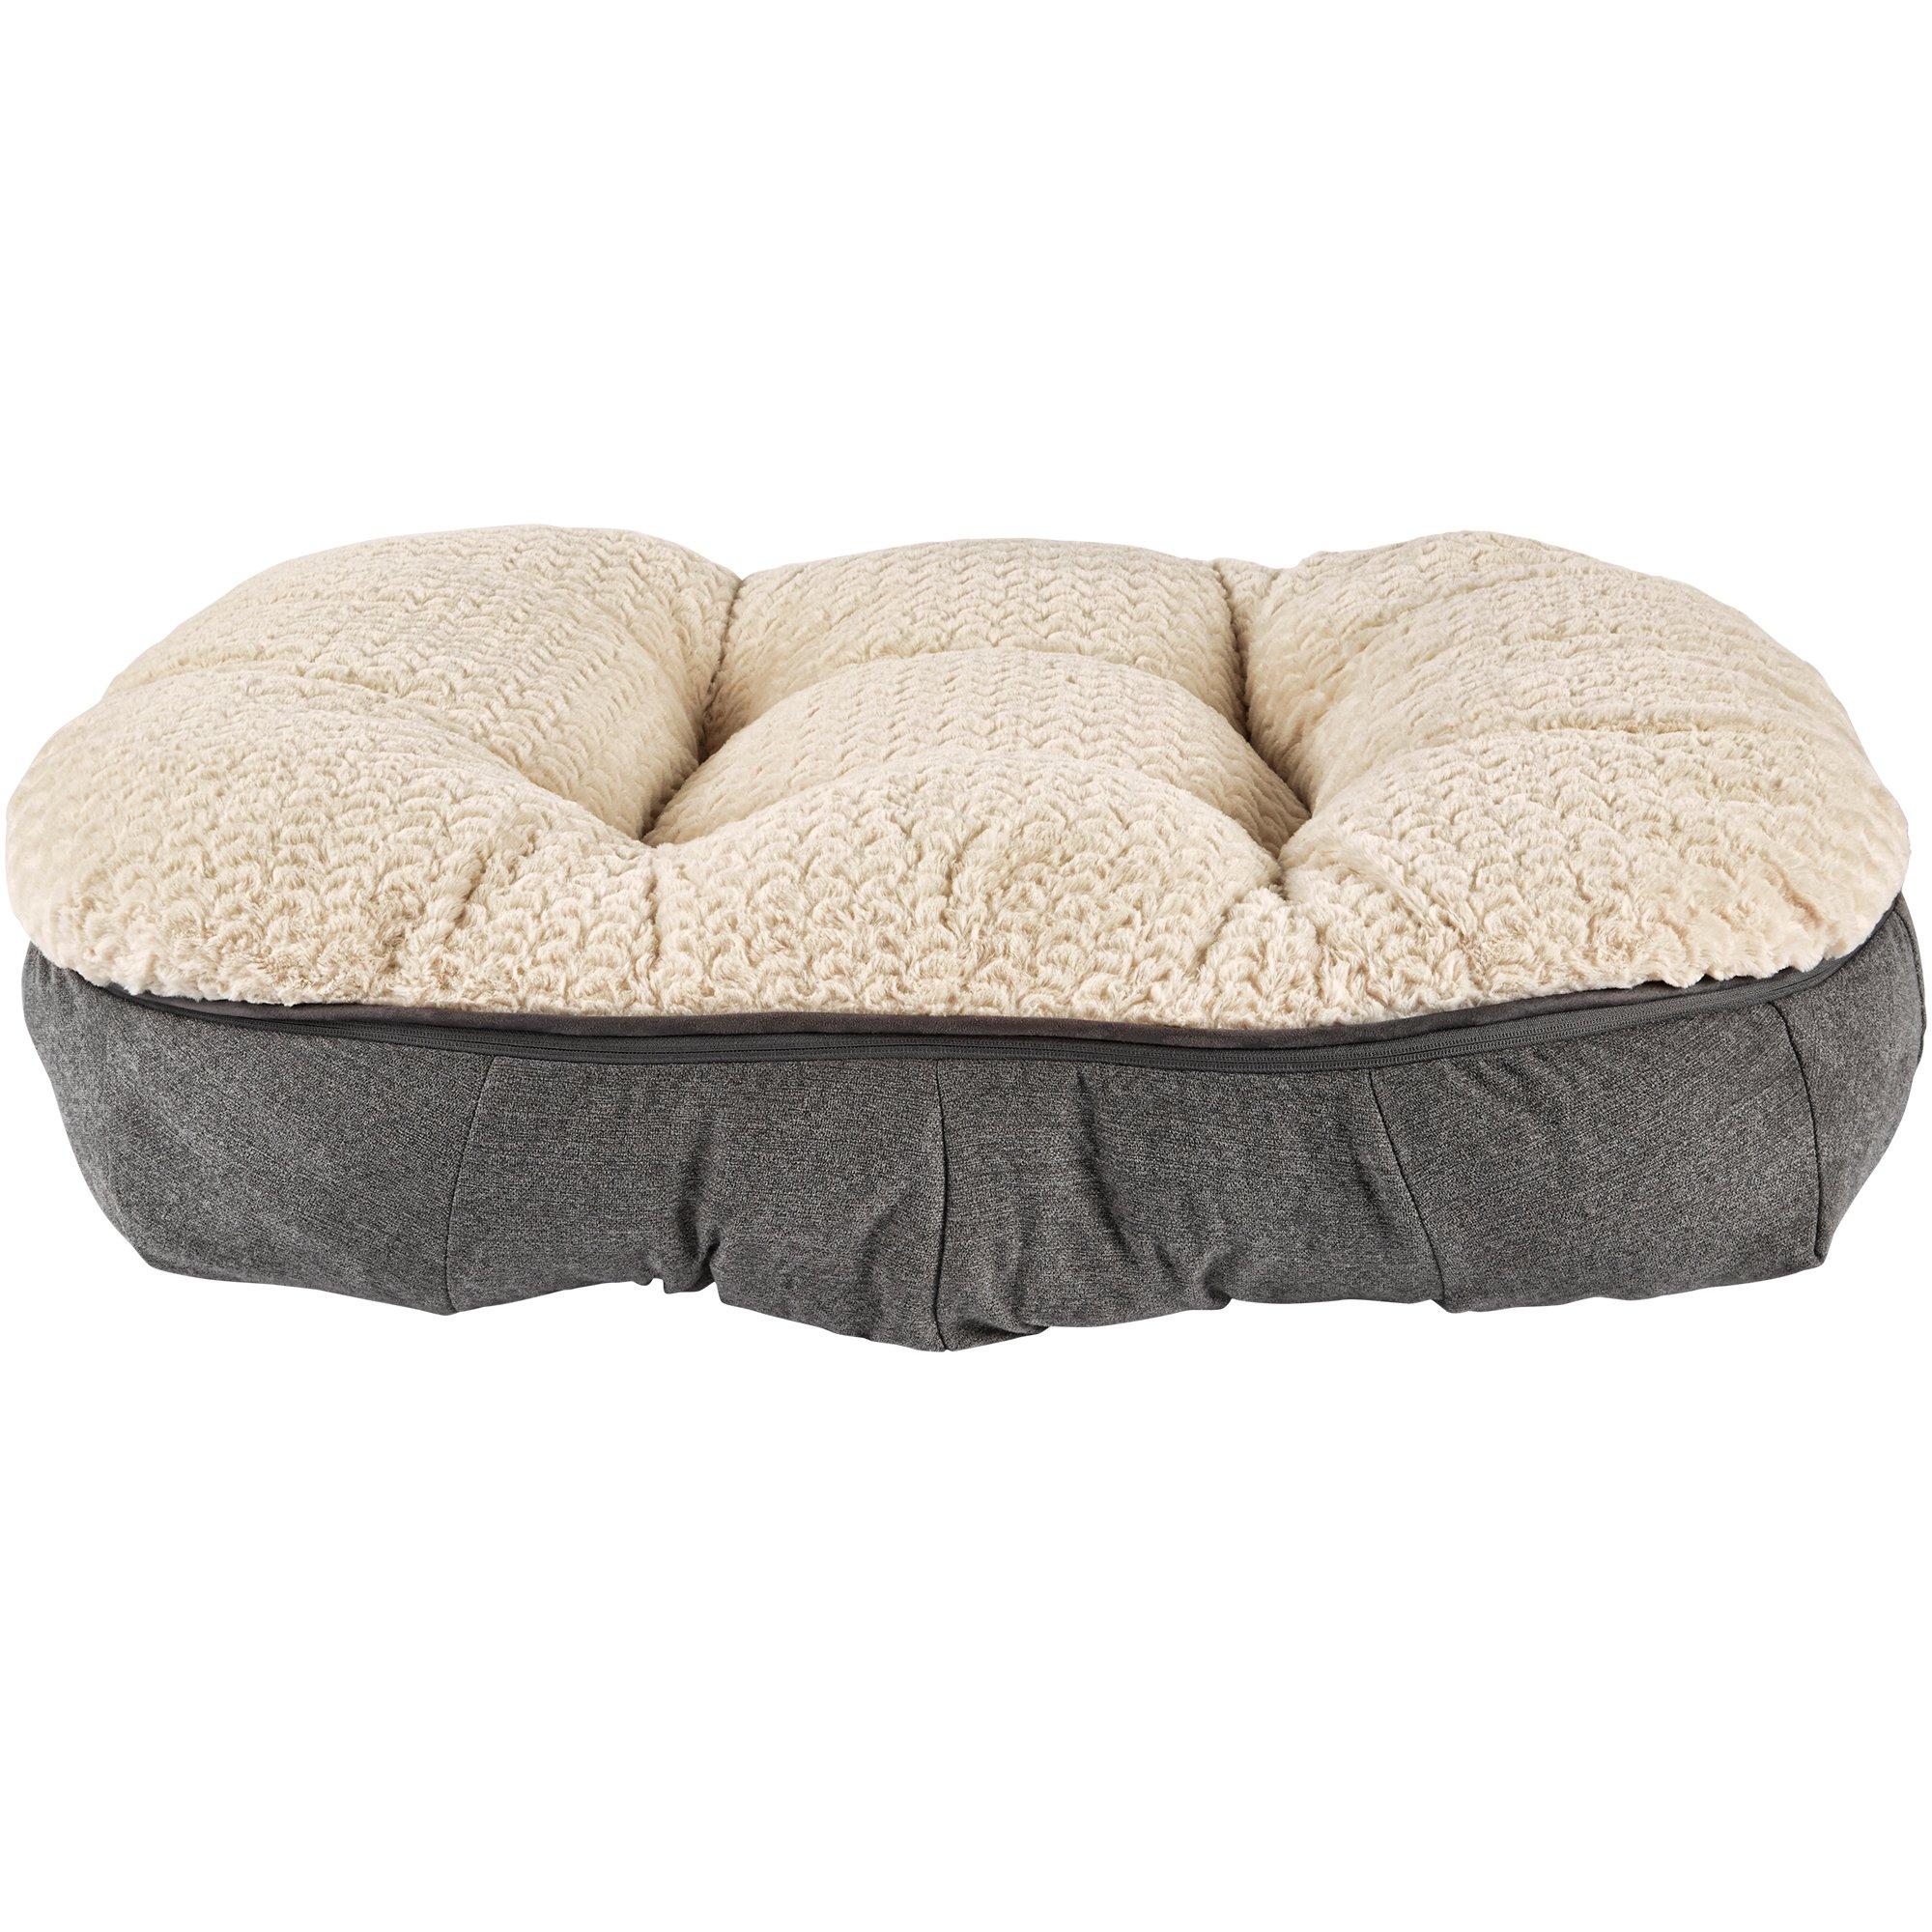 Harmony Grey Plush Lounger Memory Foam Dog Bed